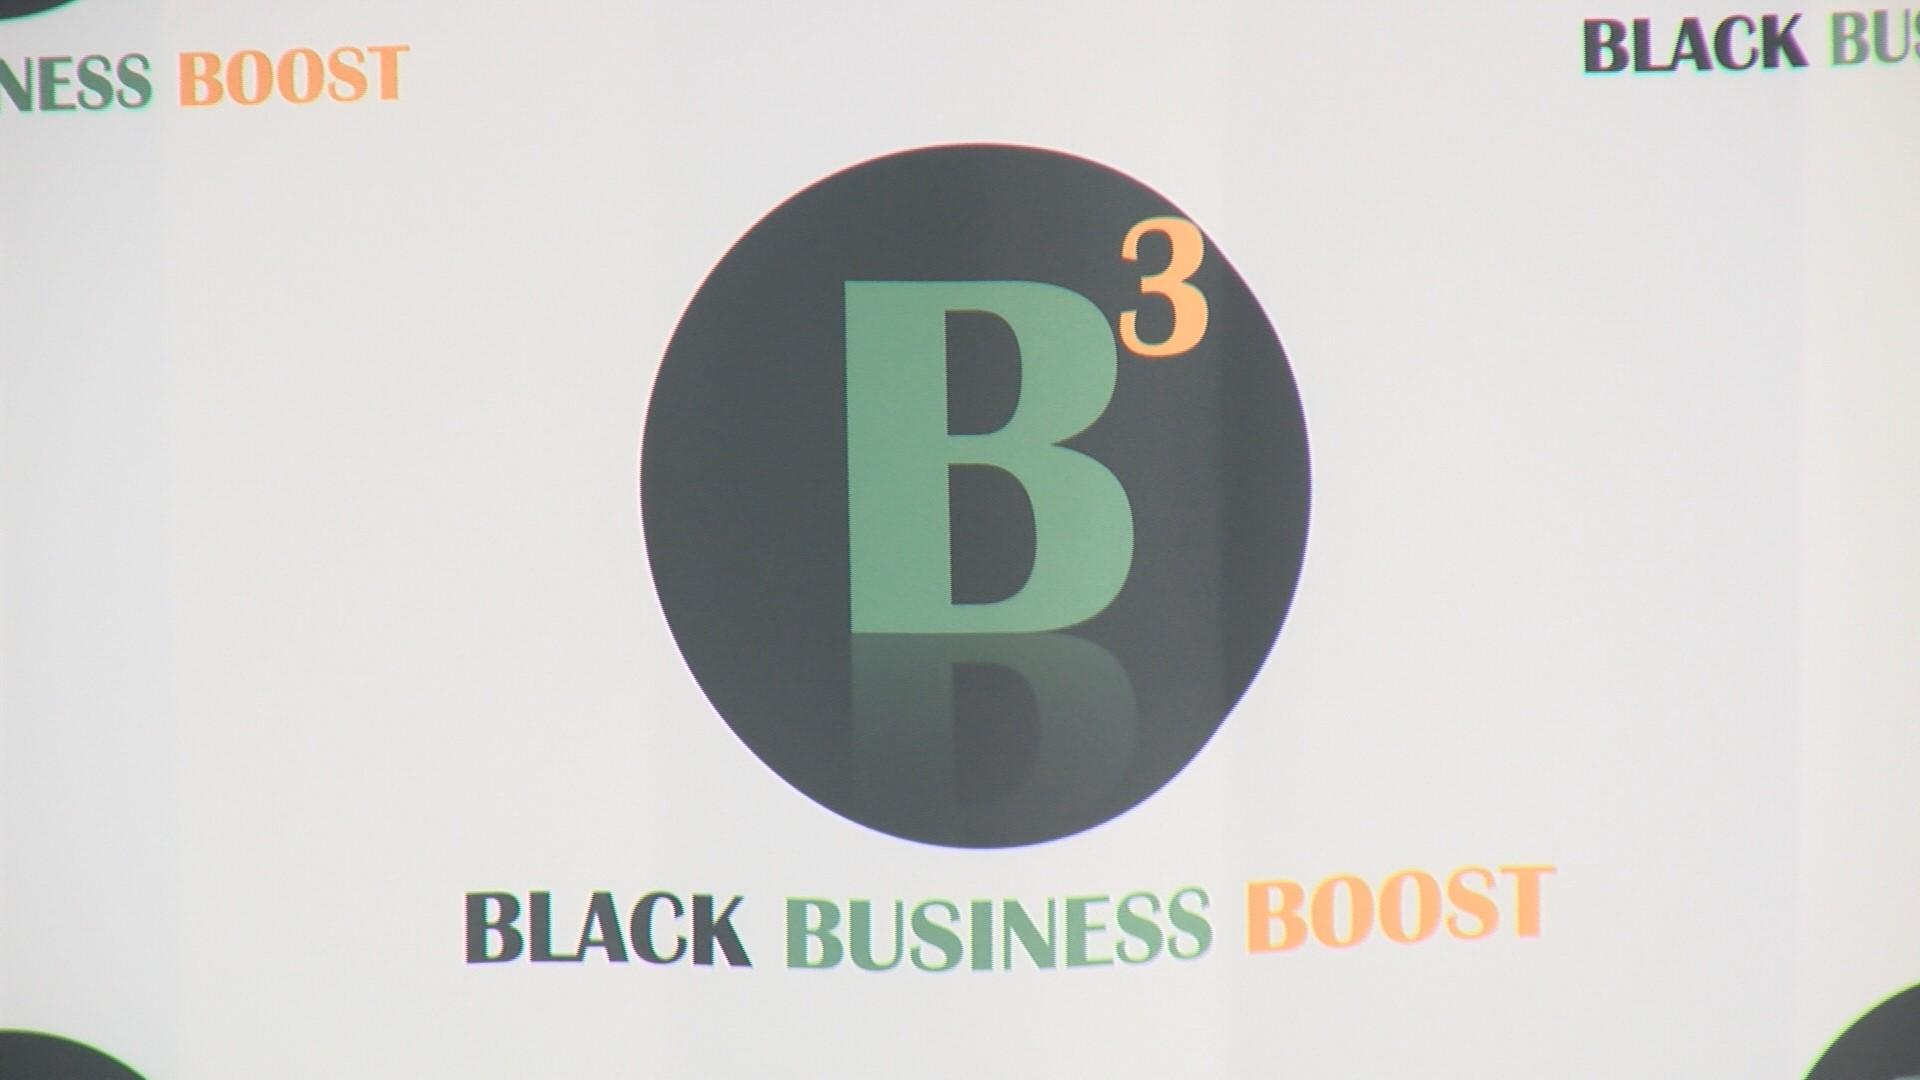 New program puts $600K toward Black businesses